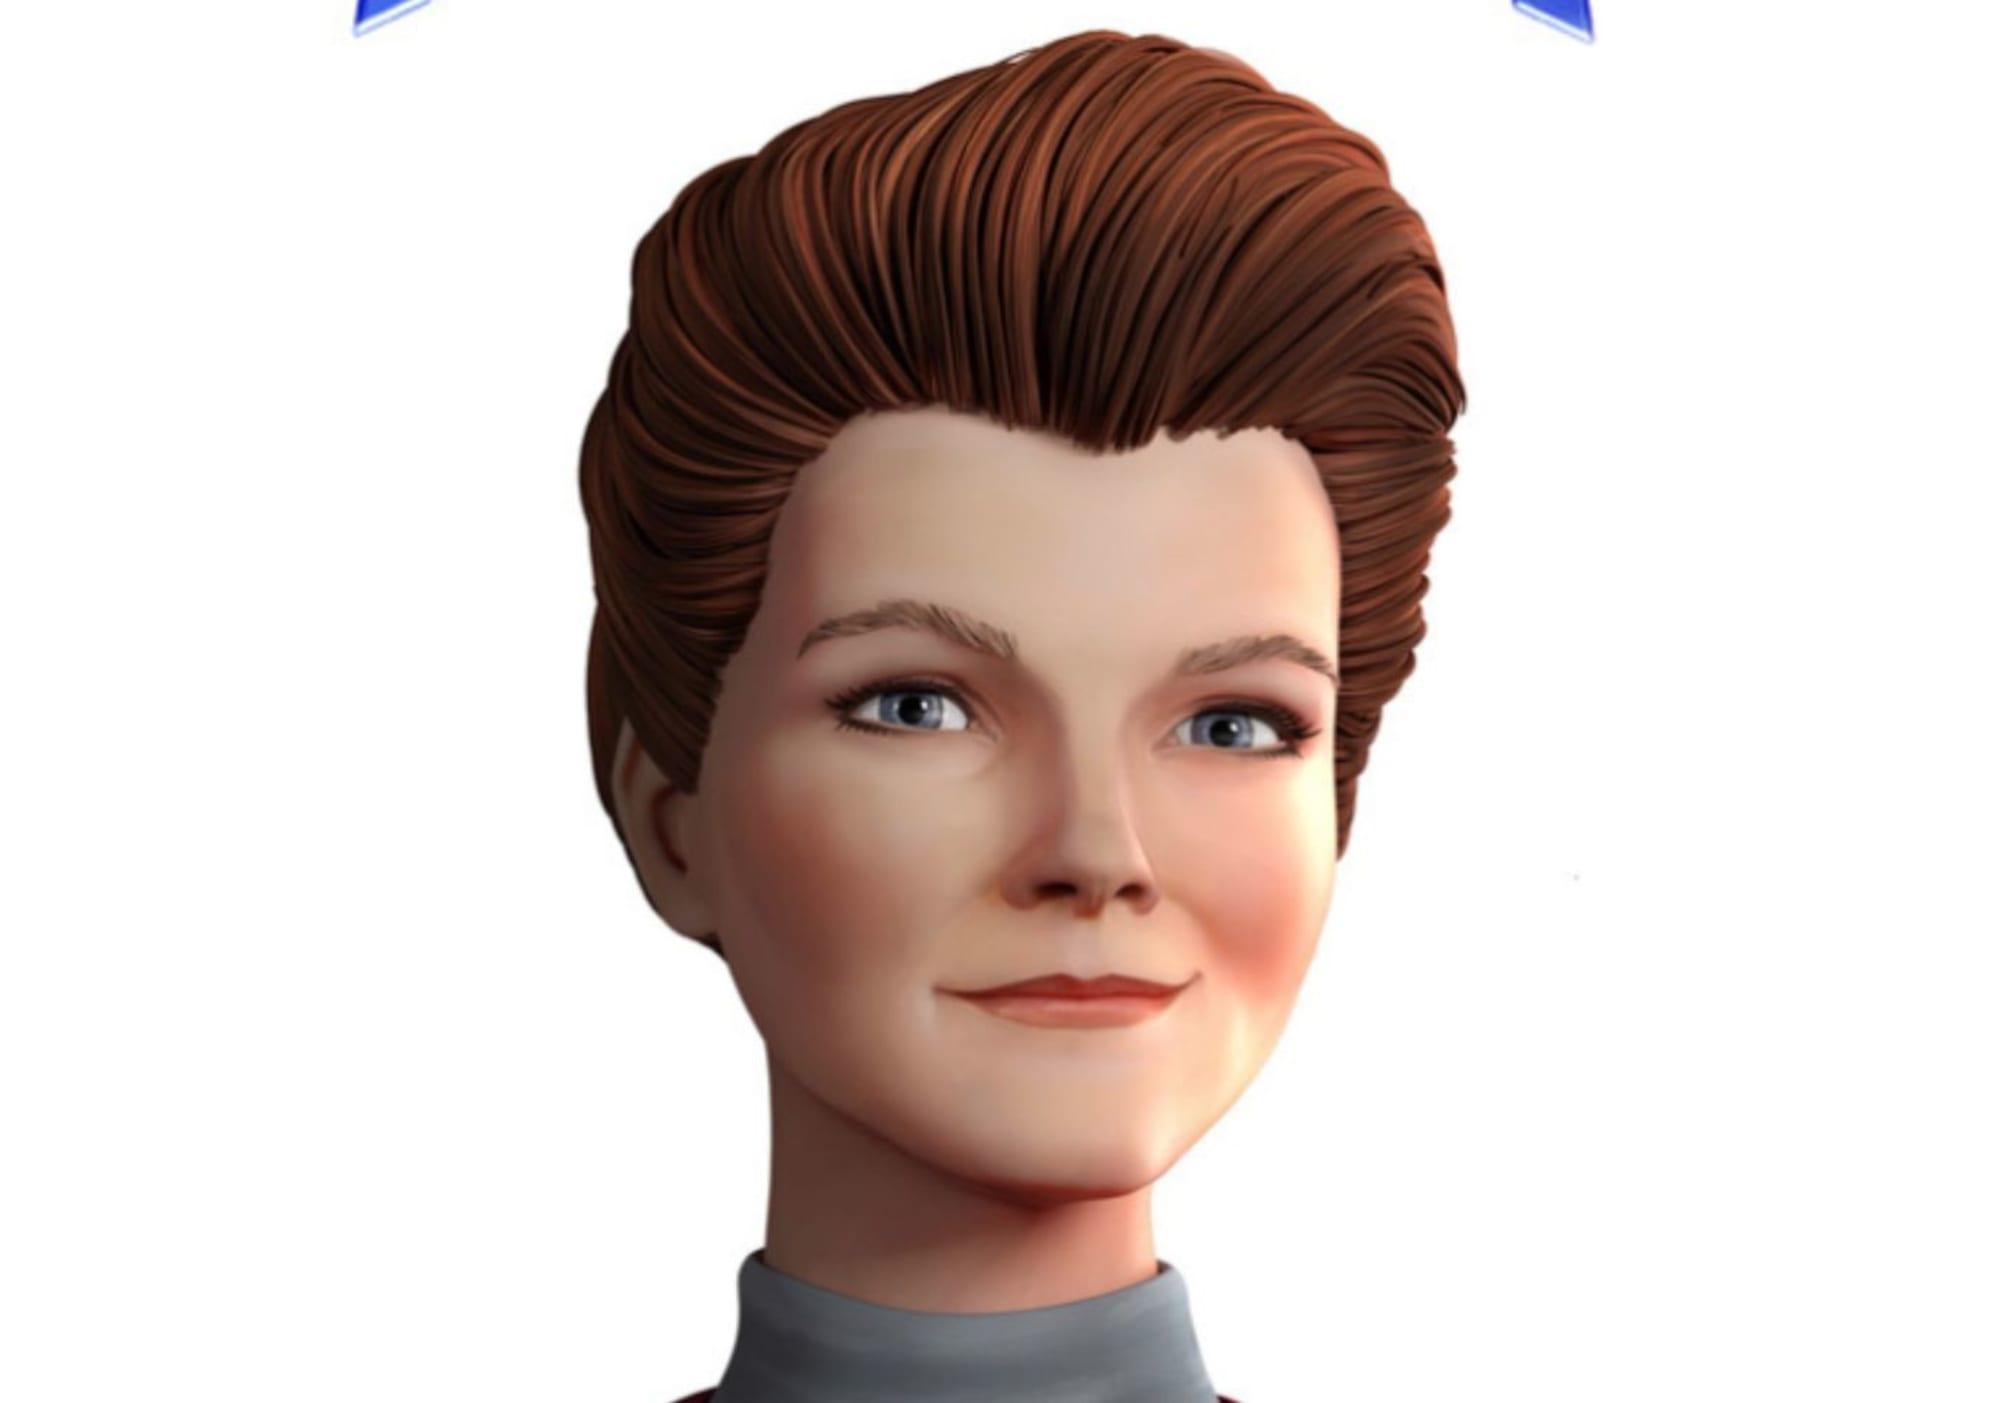 Kate Mulgrew reveals how Captain Janeway returns in Star Trek: Prodigy